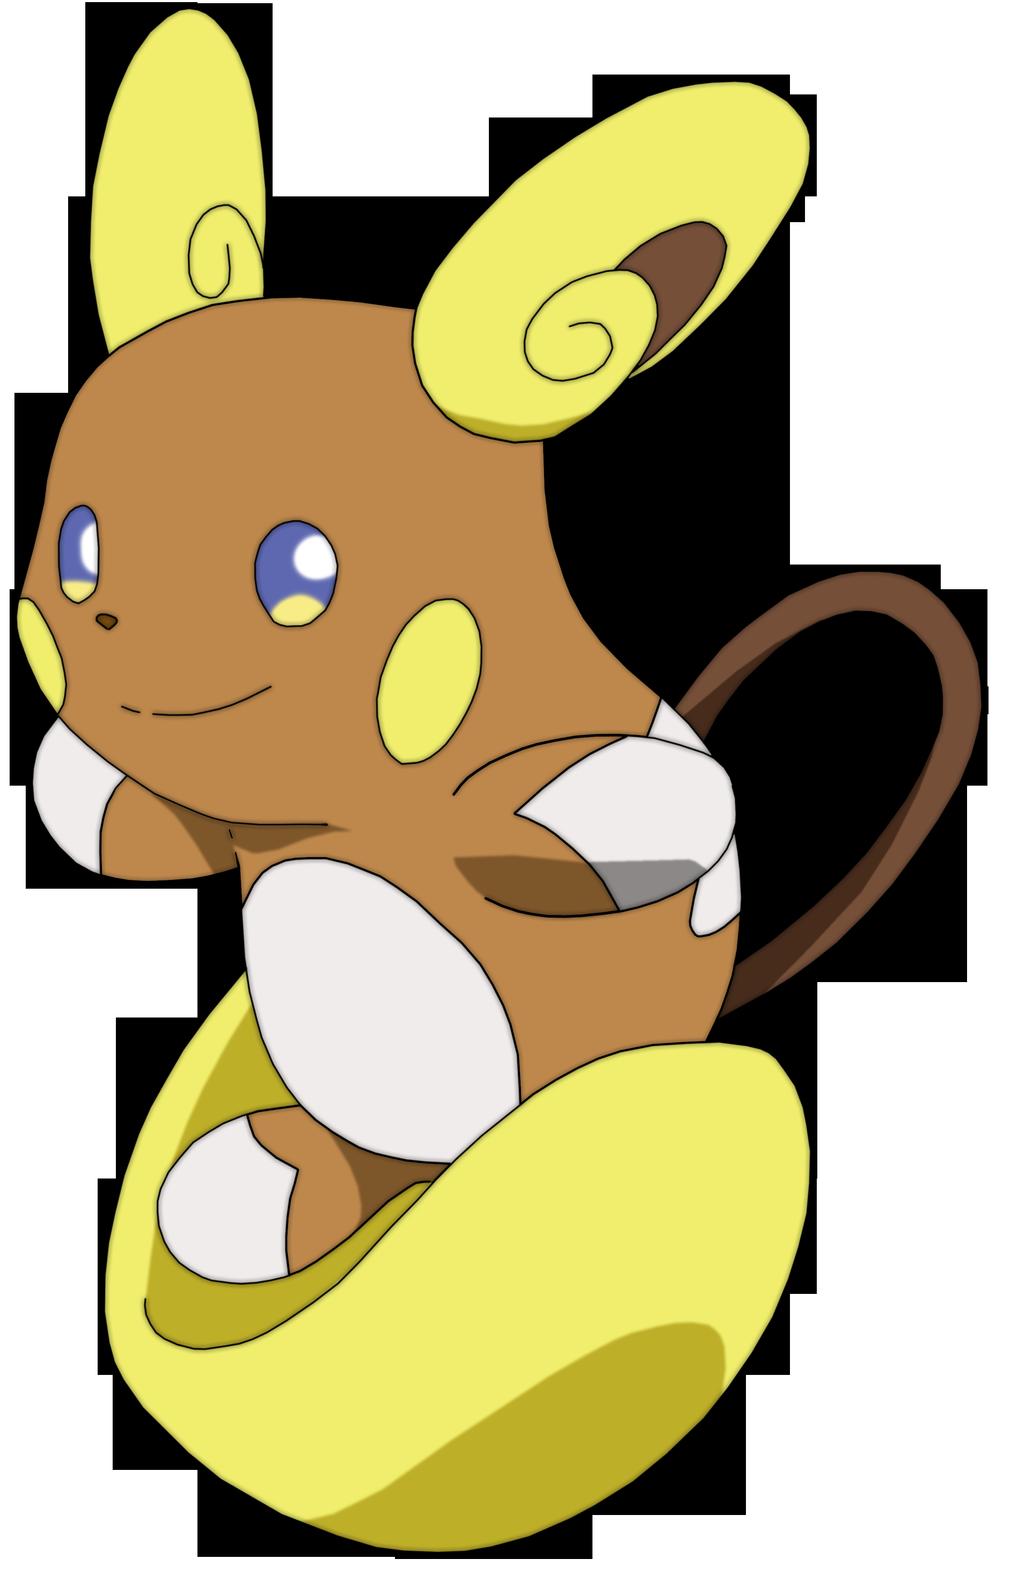 Raichu Alola By Uraharataichou On Deviantart Raichu Pokemon Alola Pokemon Pokedex